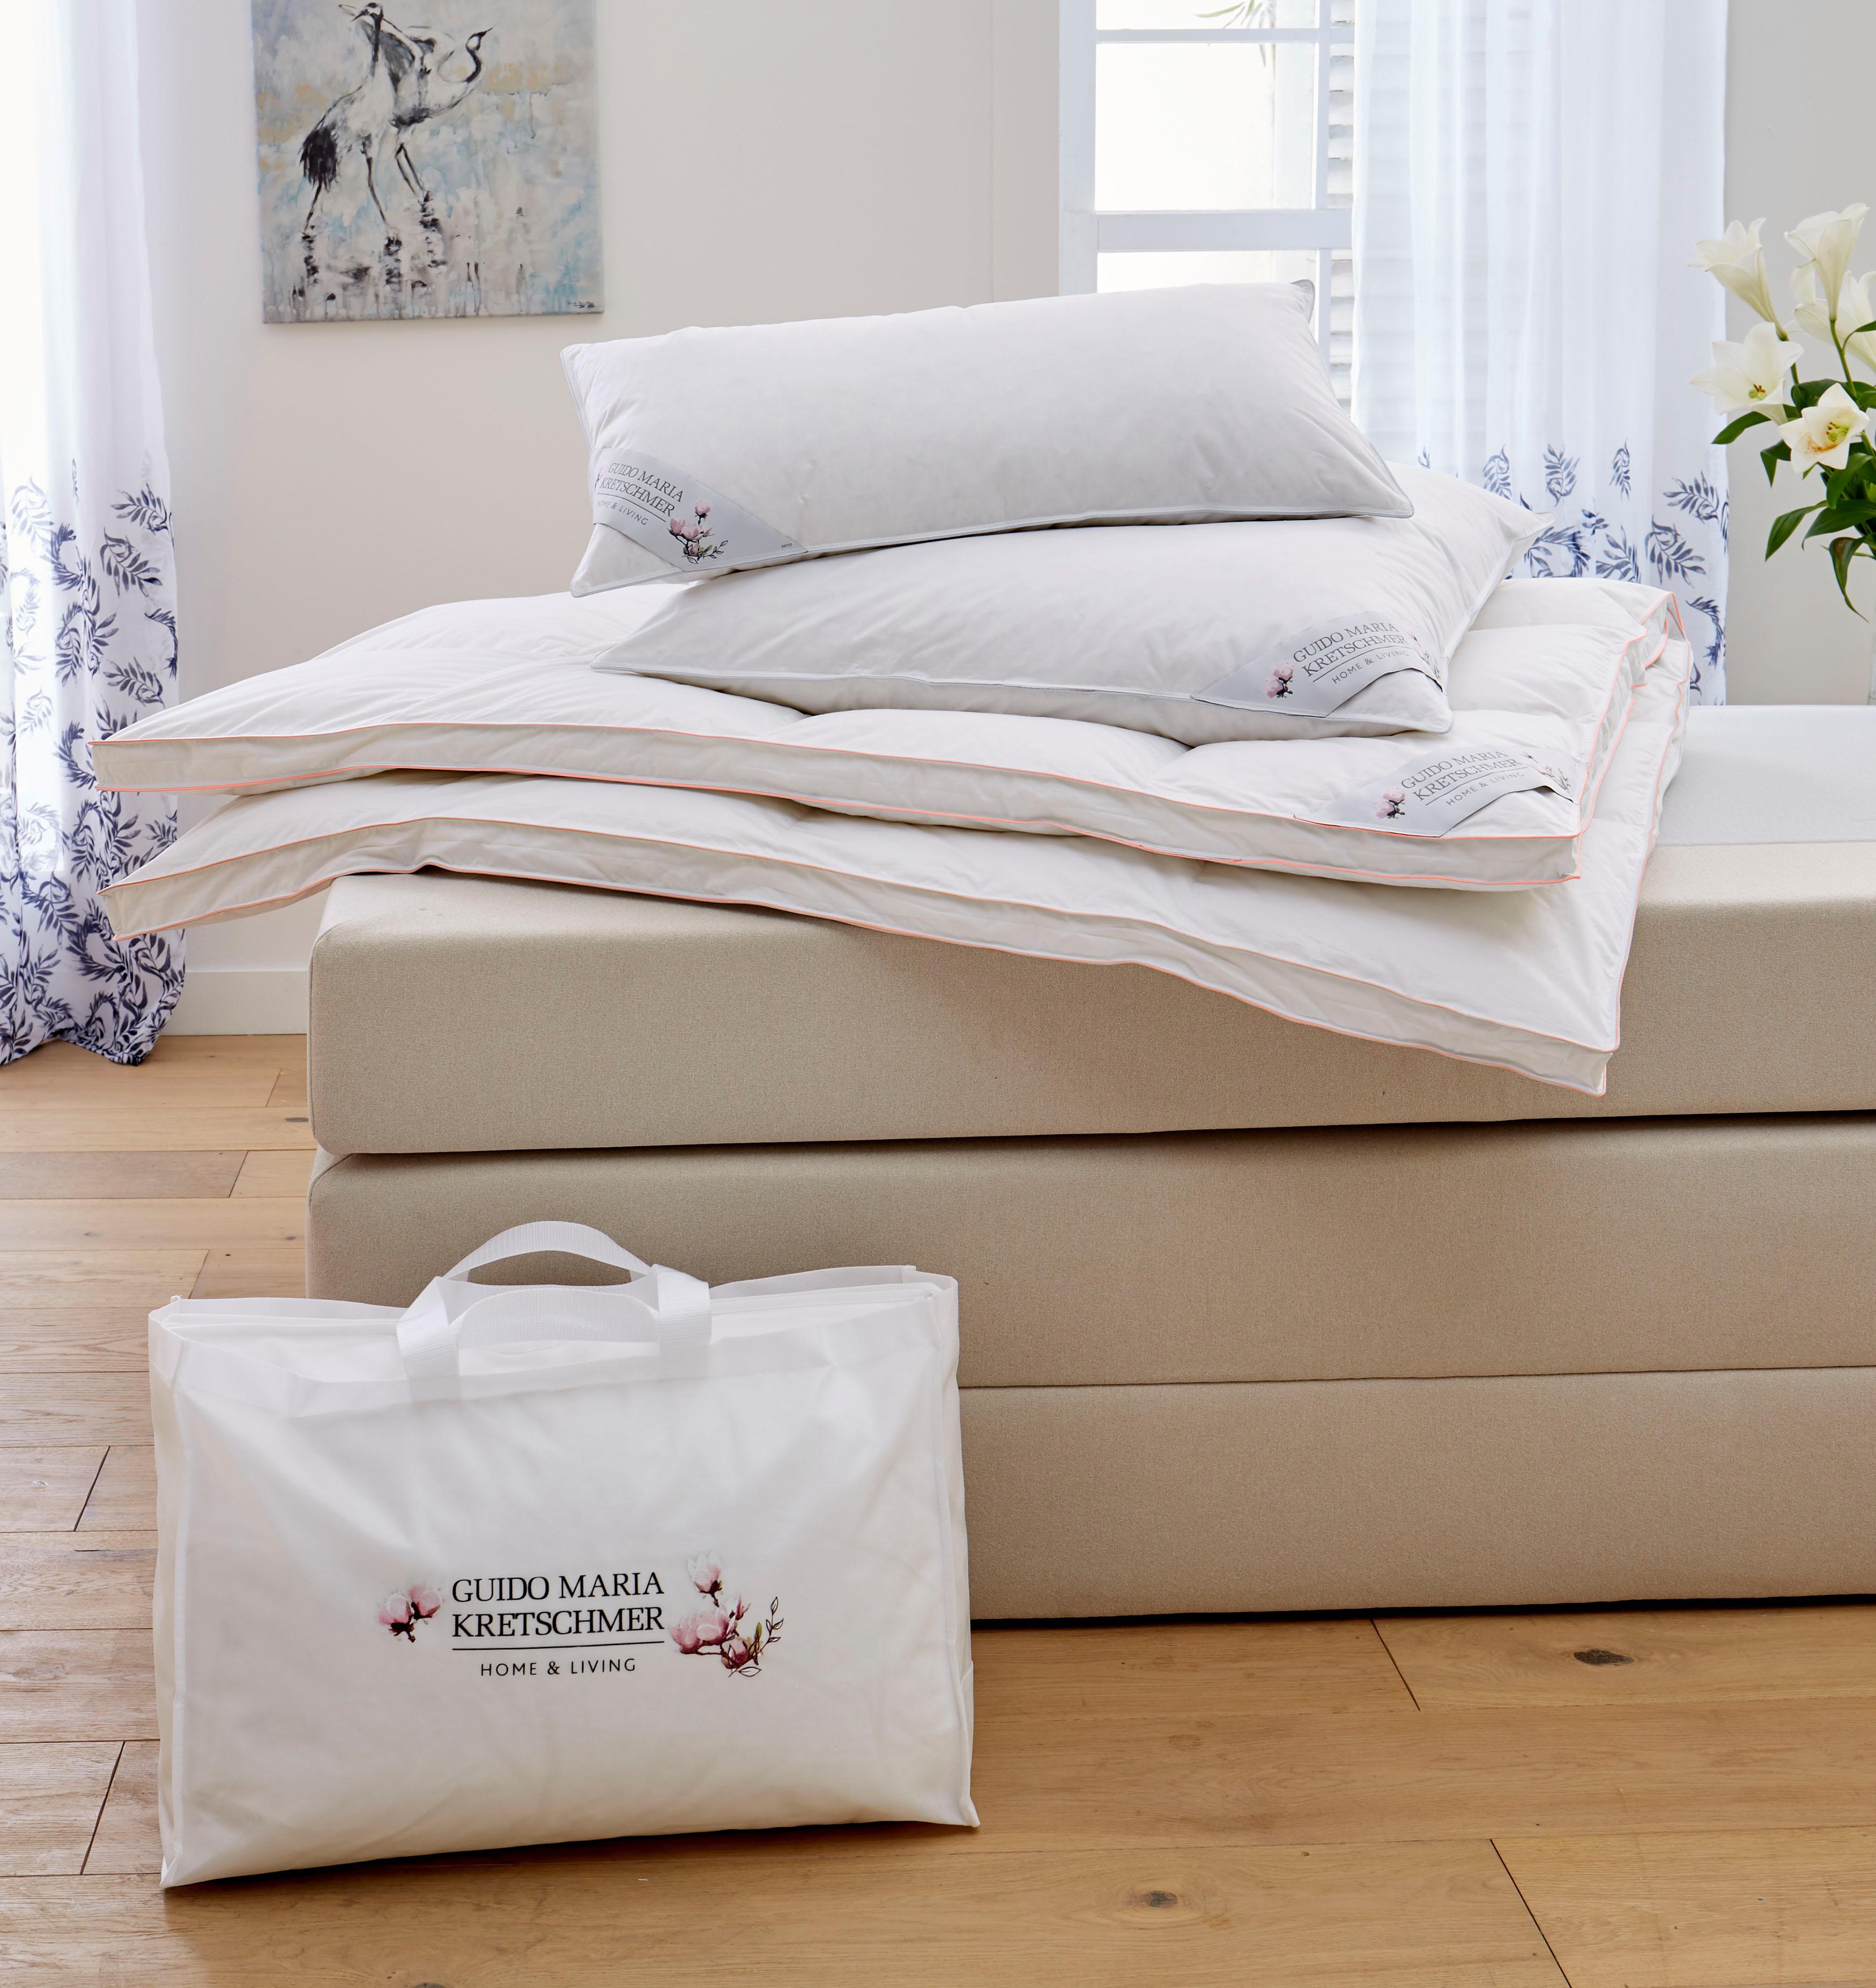 Bettdeckenset Magnolia GMK Home & Living Warm 100% Gänsedaunen